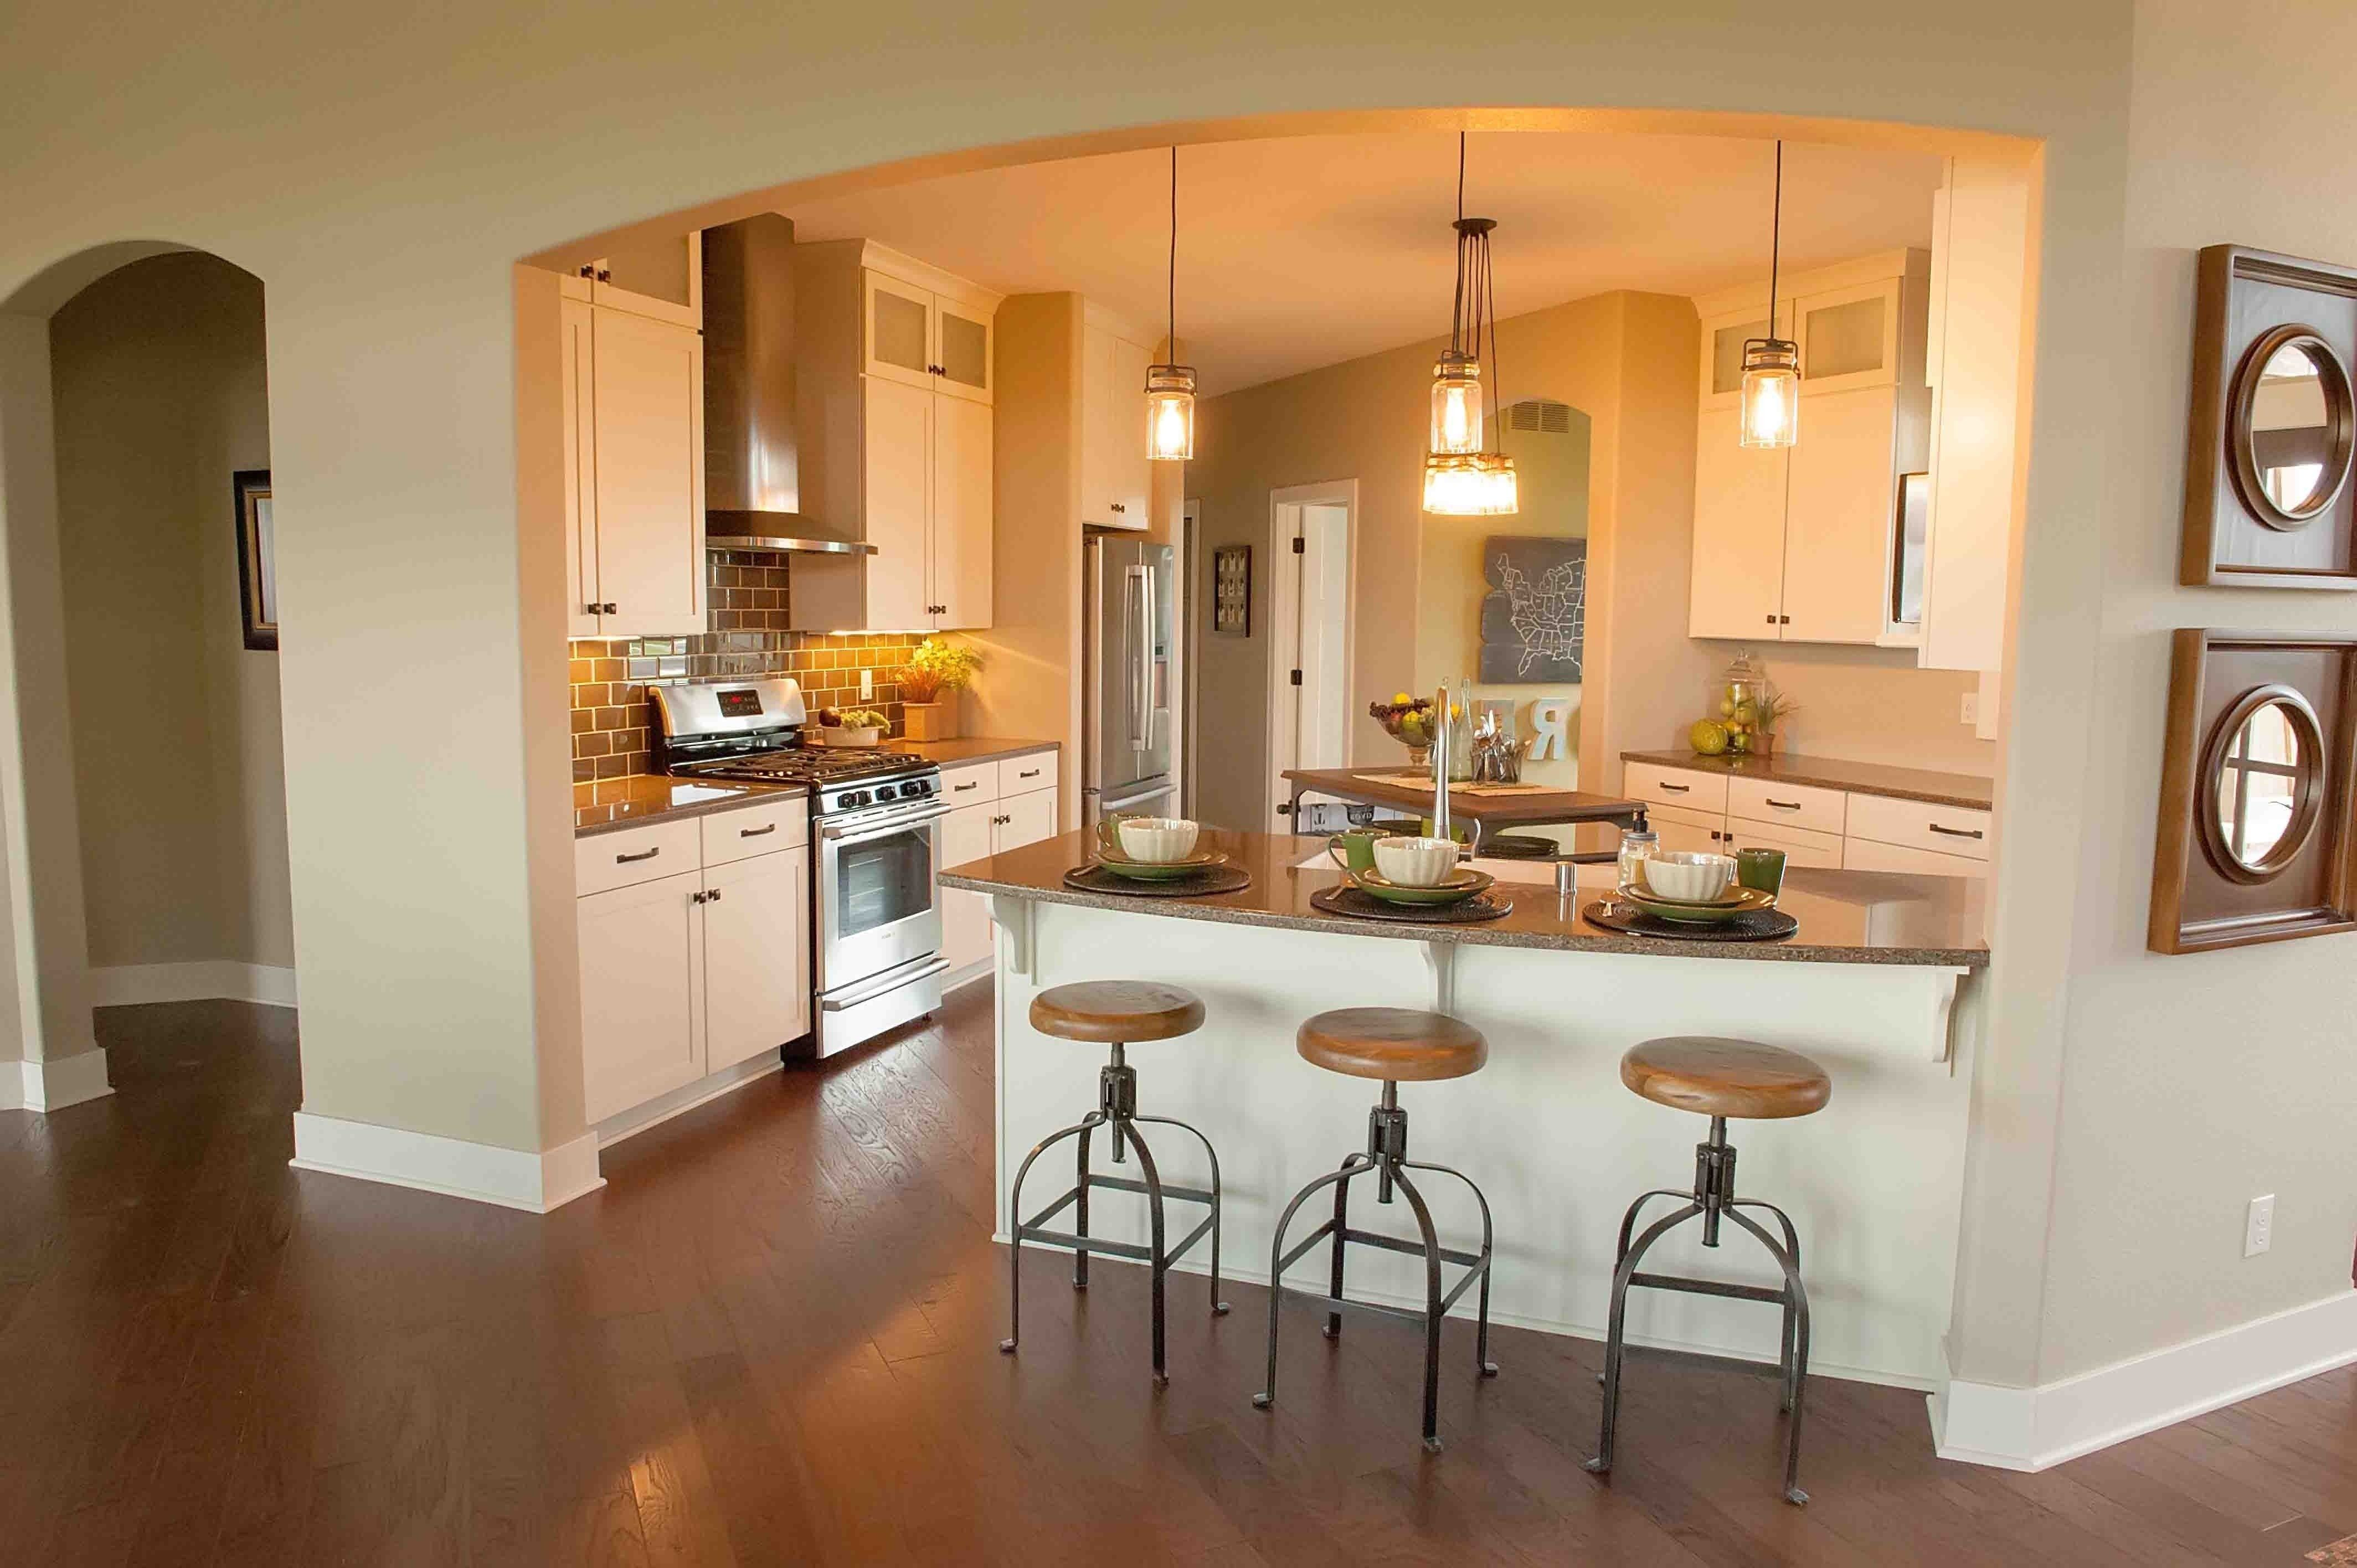 20 stunning kitchen peninsula designs with seating with images peninsula kitchen design on kitchen island ideas organization id=16820